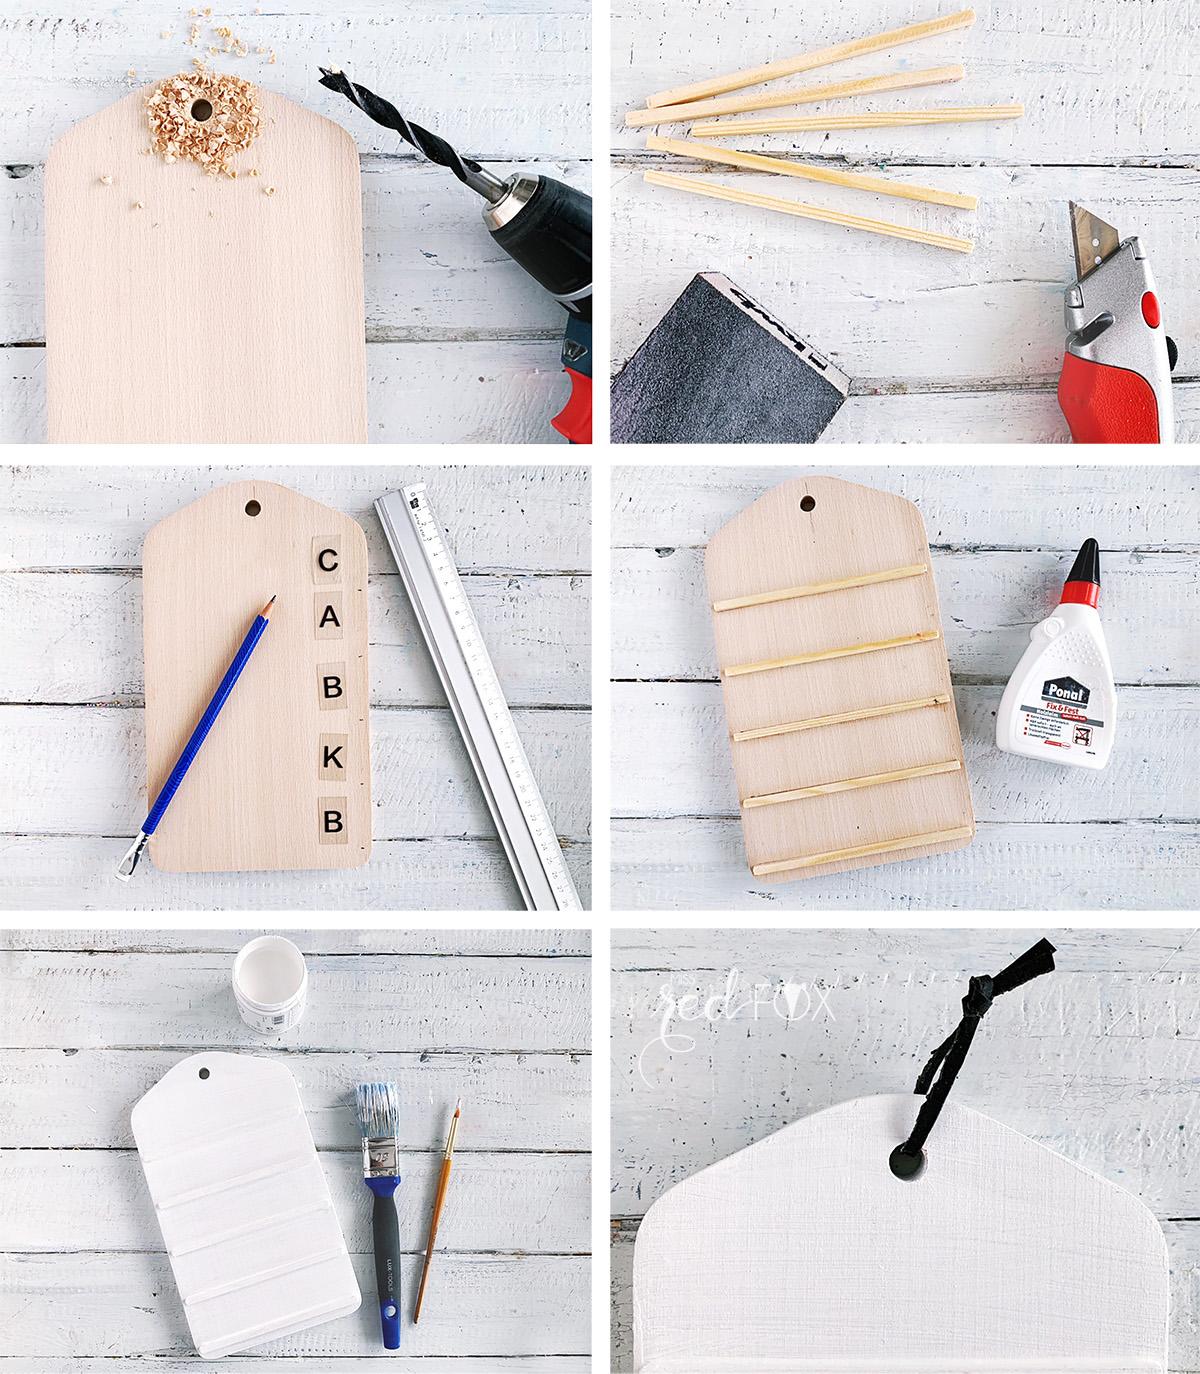 missredfox - 12giftswithlove 03 - Deko - Mini DIY Letterboard - 04